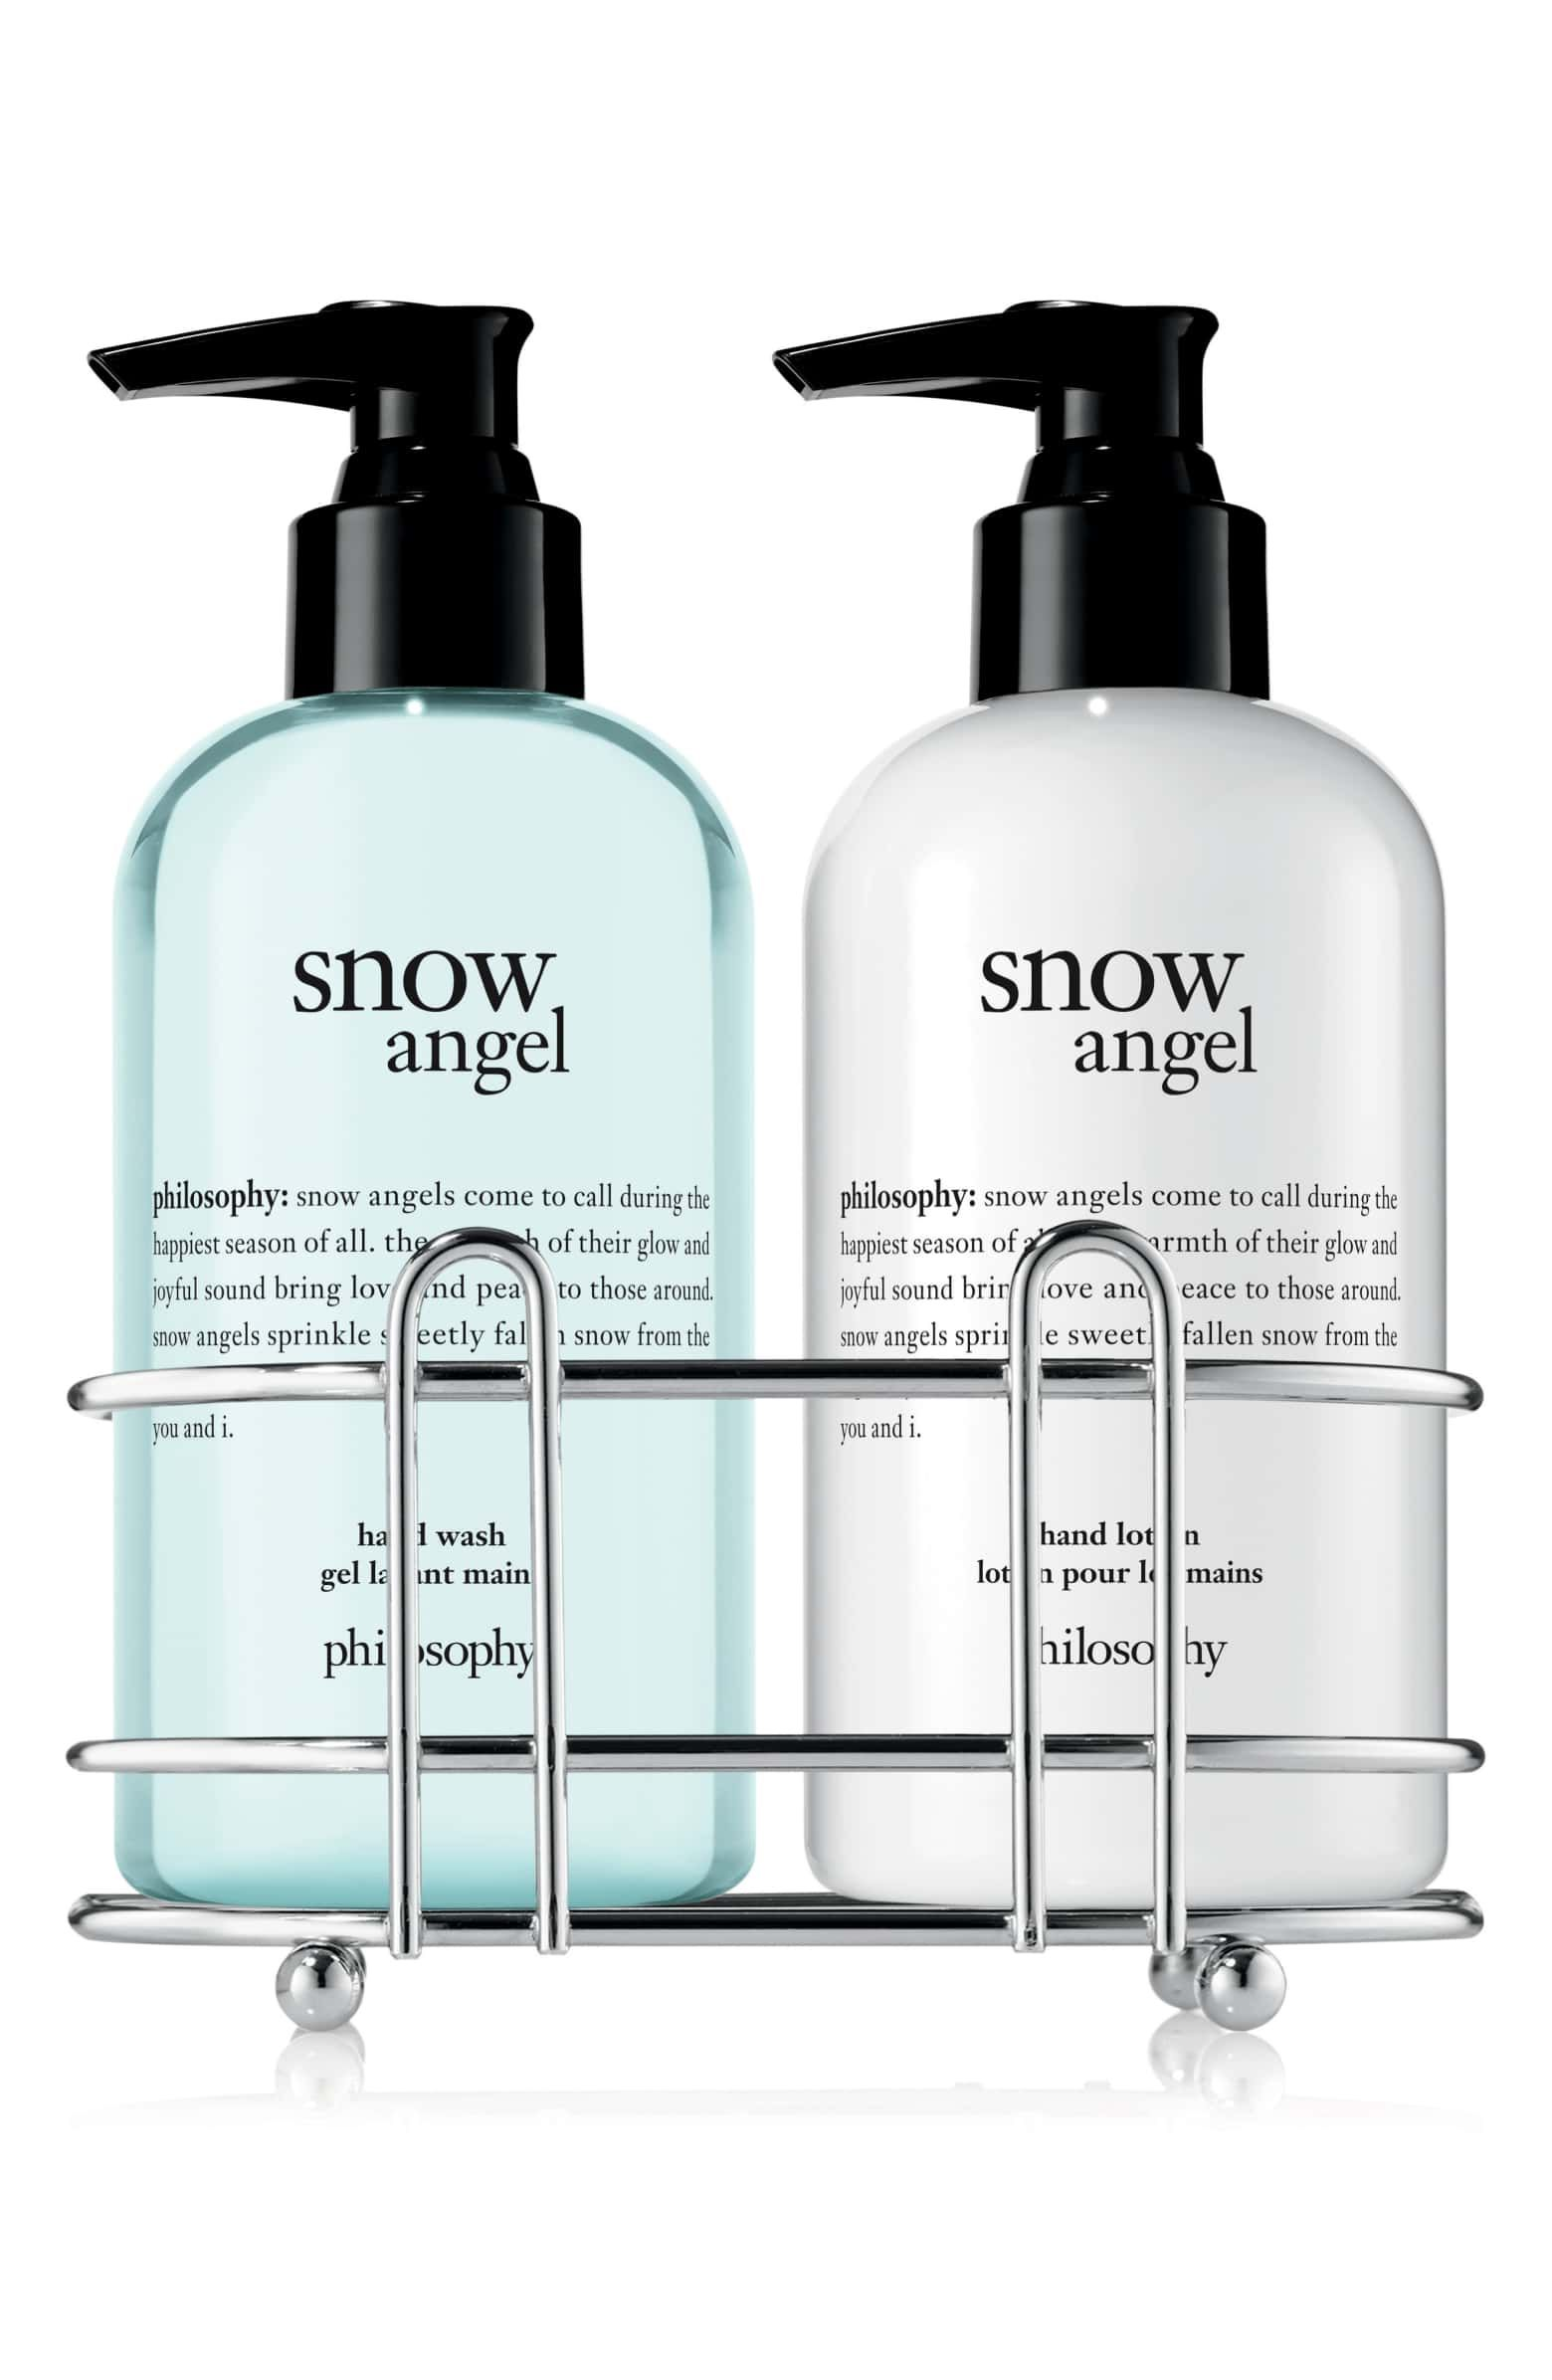 Philosophy Snow Angel Hand Care Duo Nordstrom Hand Care Snow Angels Skin Care Gifts